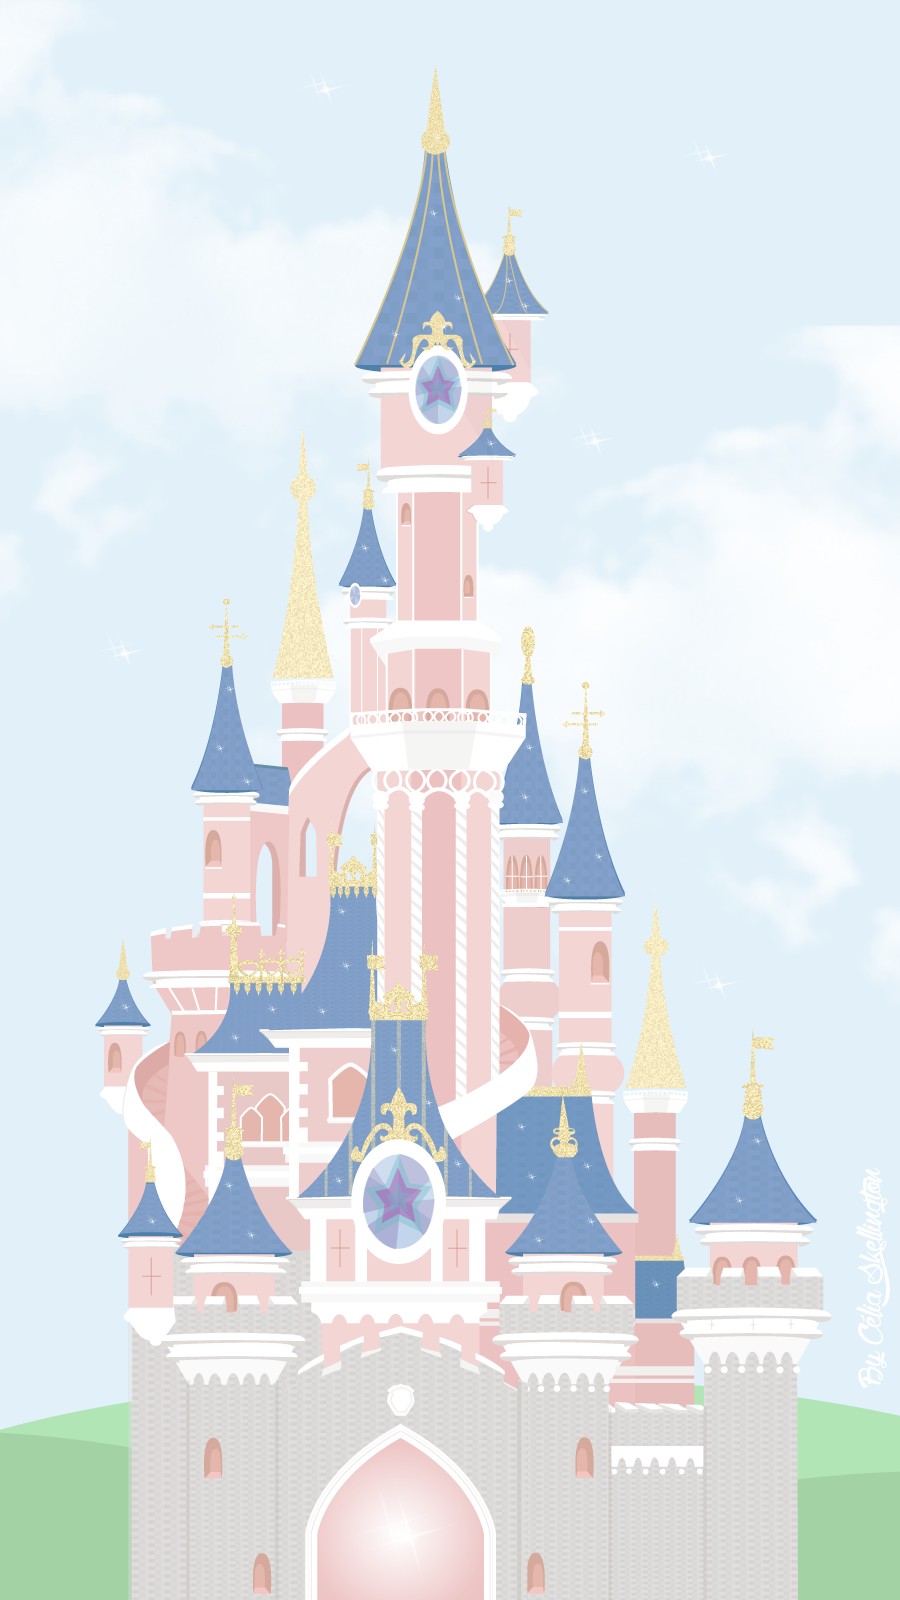 Blog Celiasamyn Be Wp Content Uploads 2015 04 Dinsey2 Iphone6 Png Disney Wallpaper Wallpaper Iphone Disney Cute Disney Wallpaper